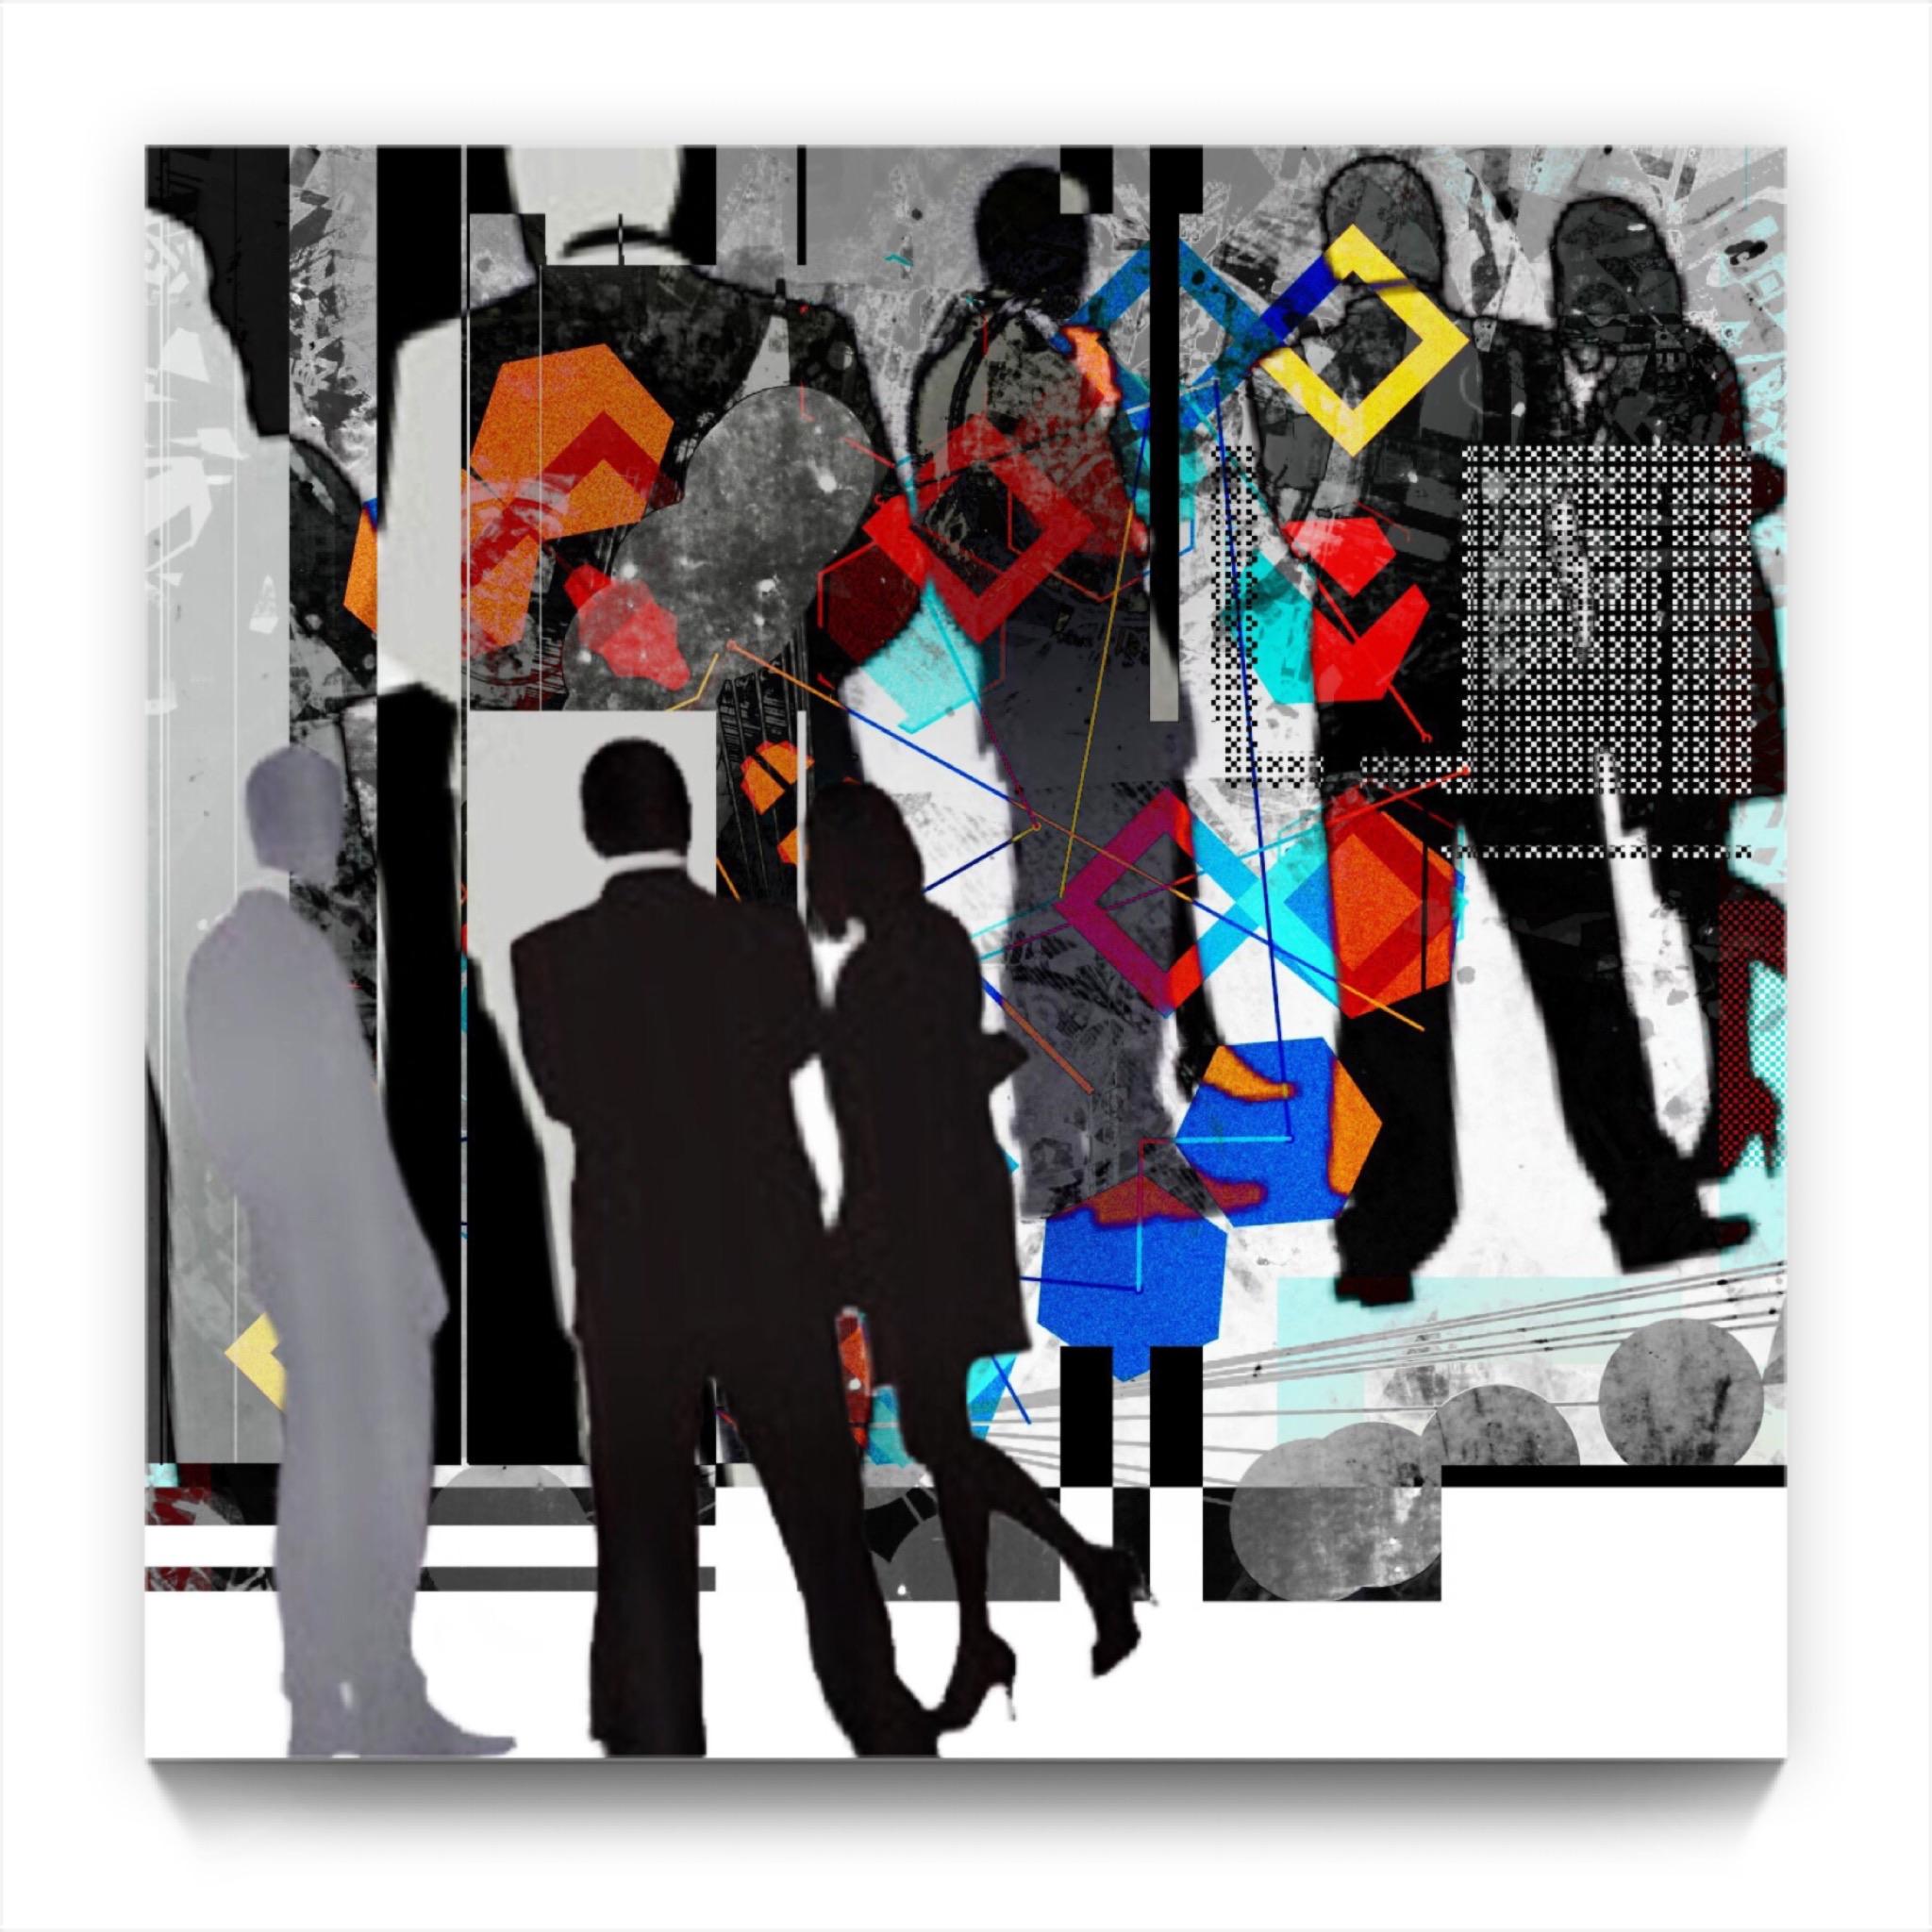 the GALLERY by new media iPhone digital artist Mark Sedgwick